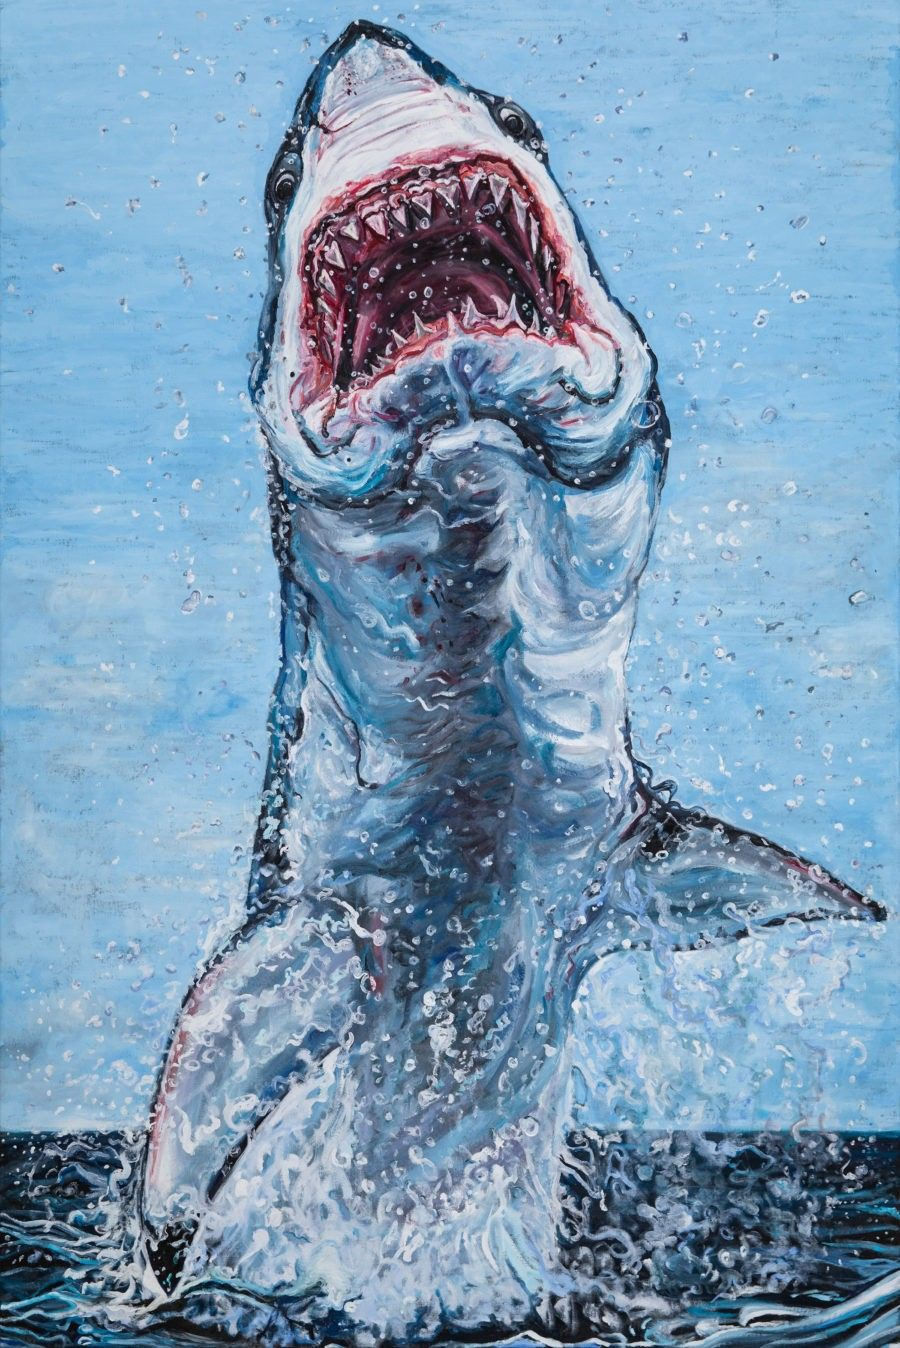 Pin By Xander Demos On Sharkin Painting Great White Shark Art